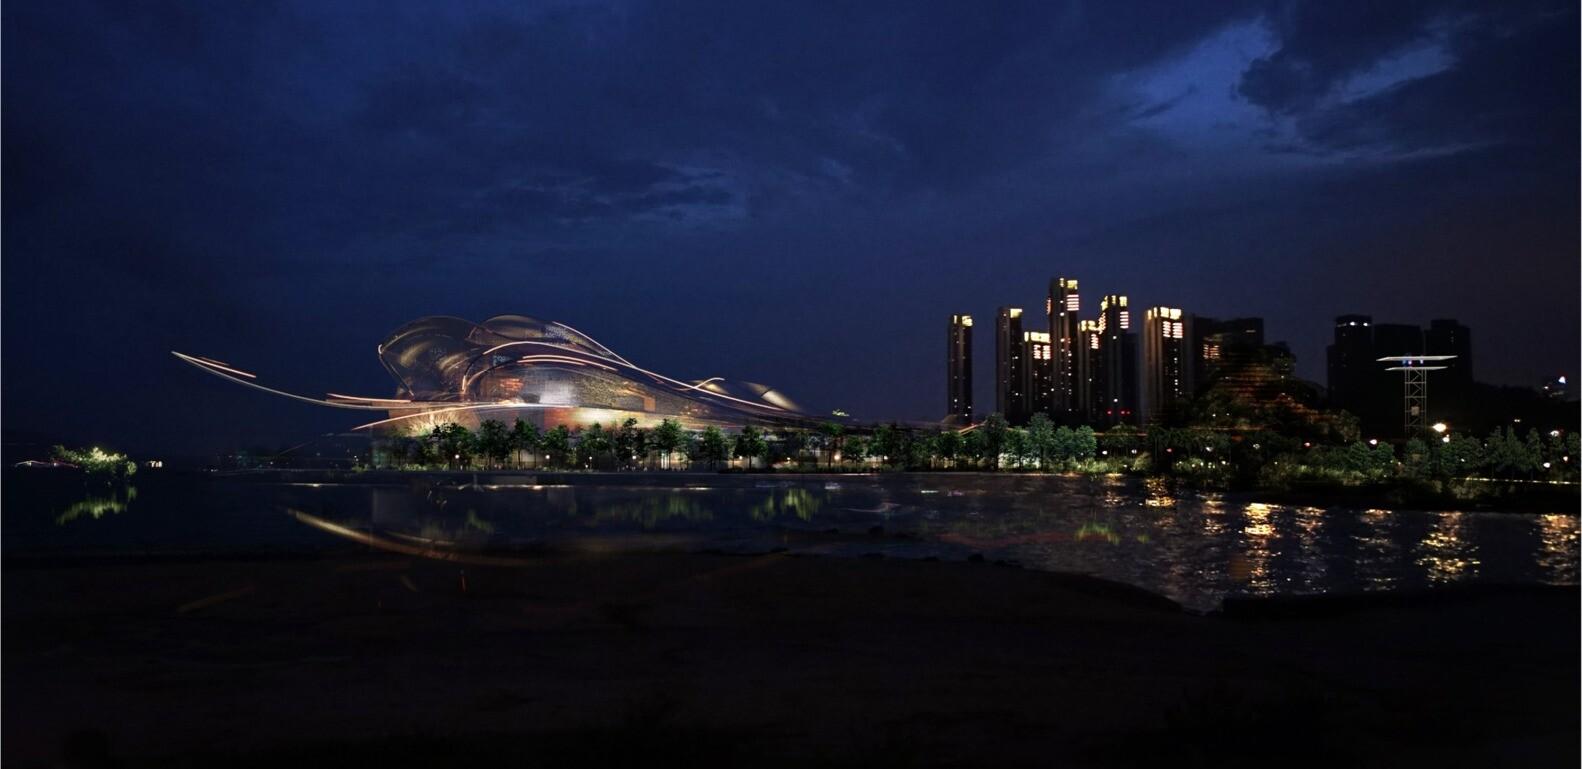 jean-nouvel-diseñara-la-opera-de-shenzhen-en-china-6-alt